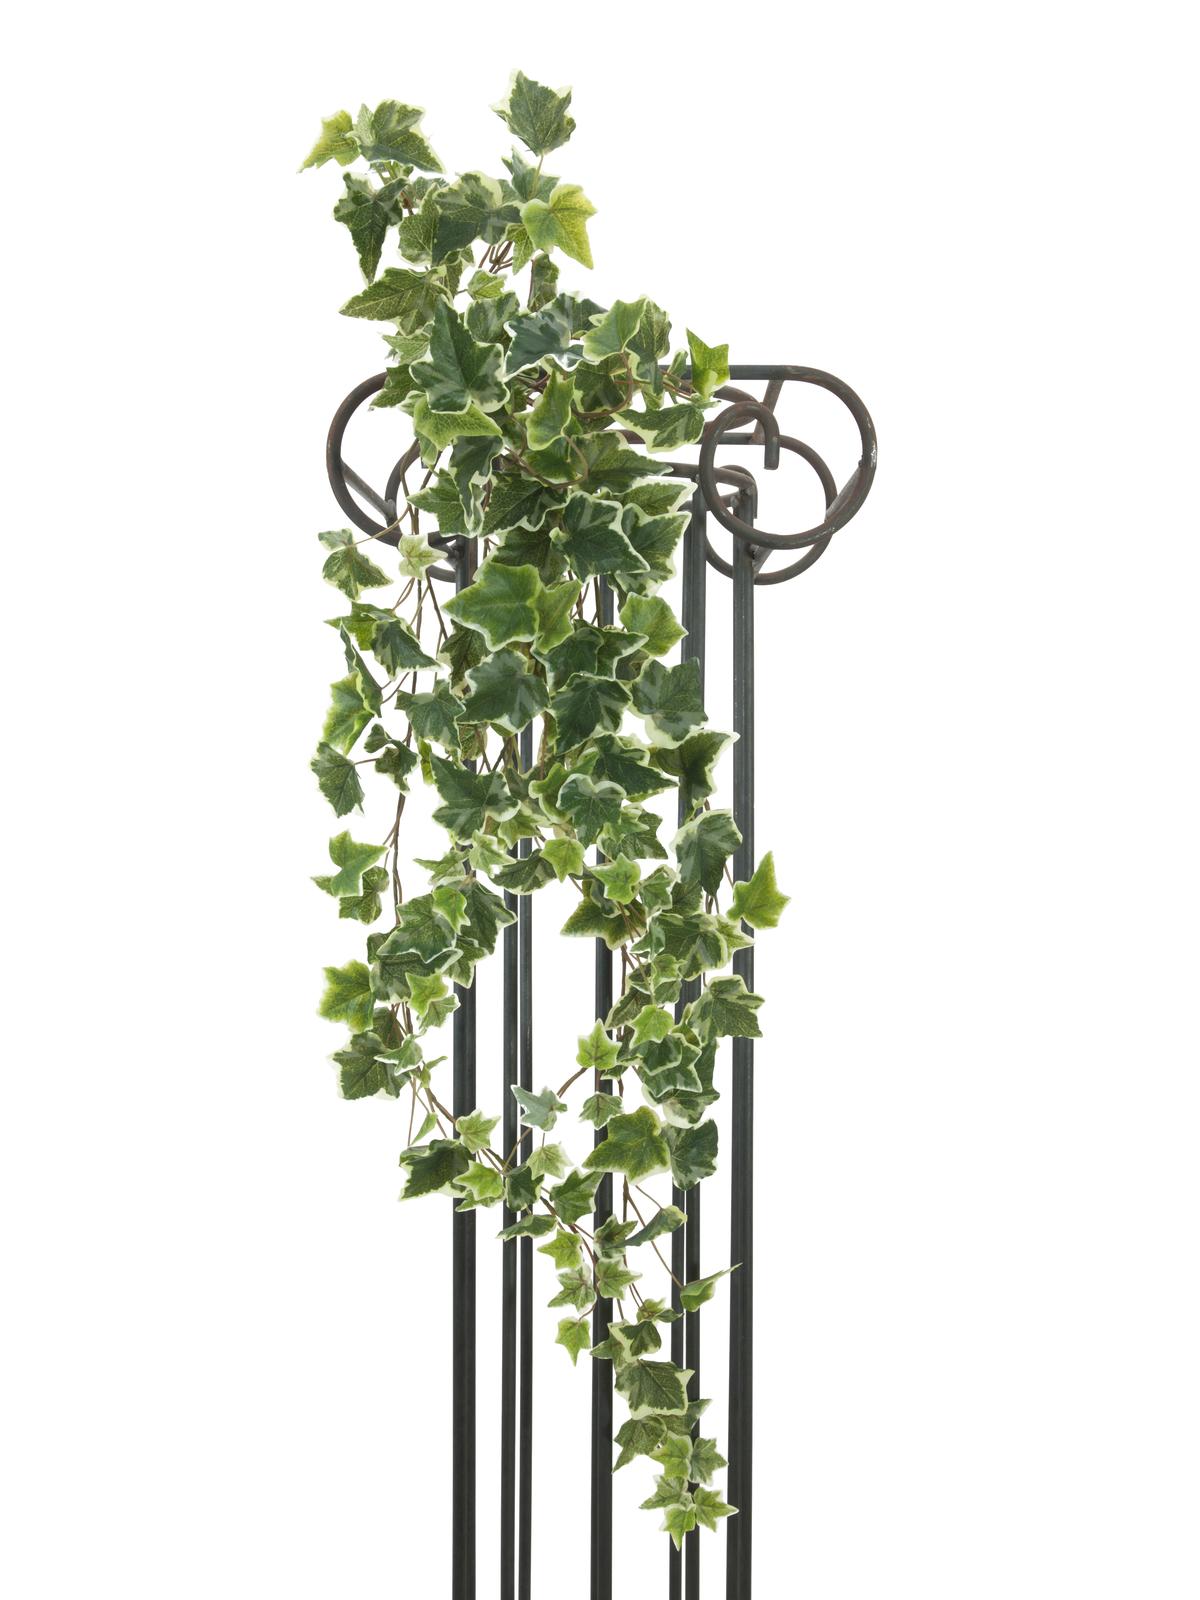 EUROPALMS Olanda Ivy garland in rilievo 183cm